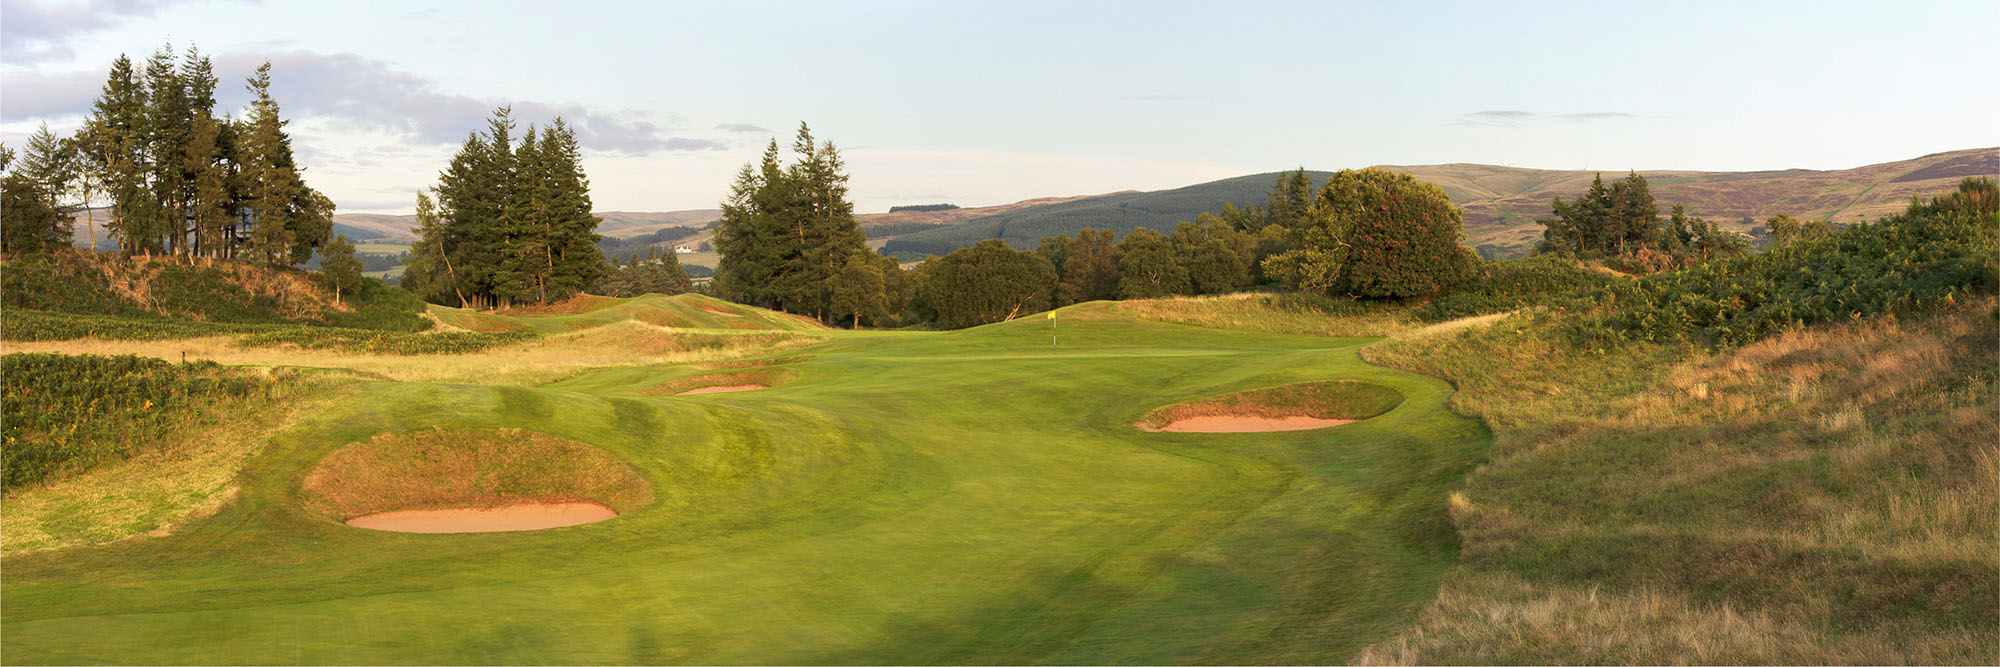 Golf Course Image - Gleneagles Kings No. 13